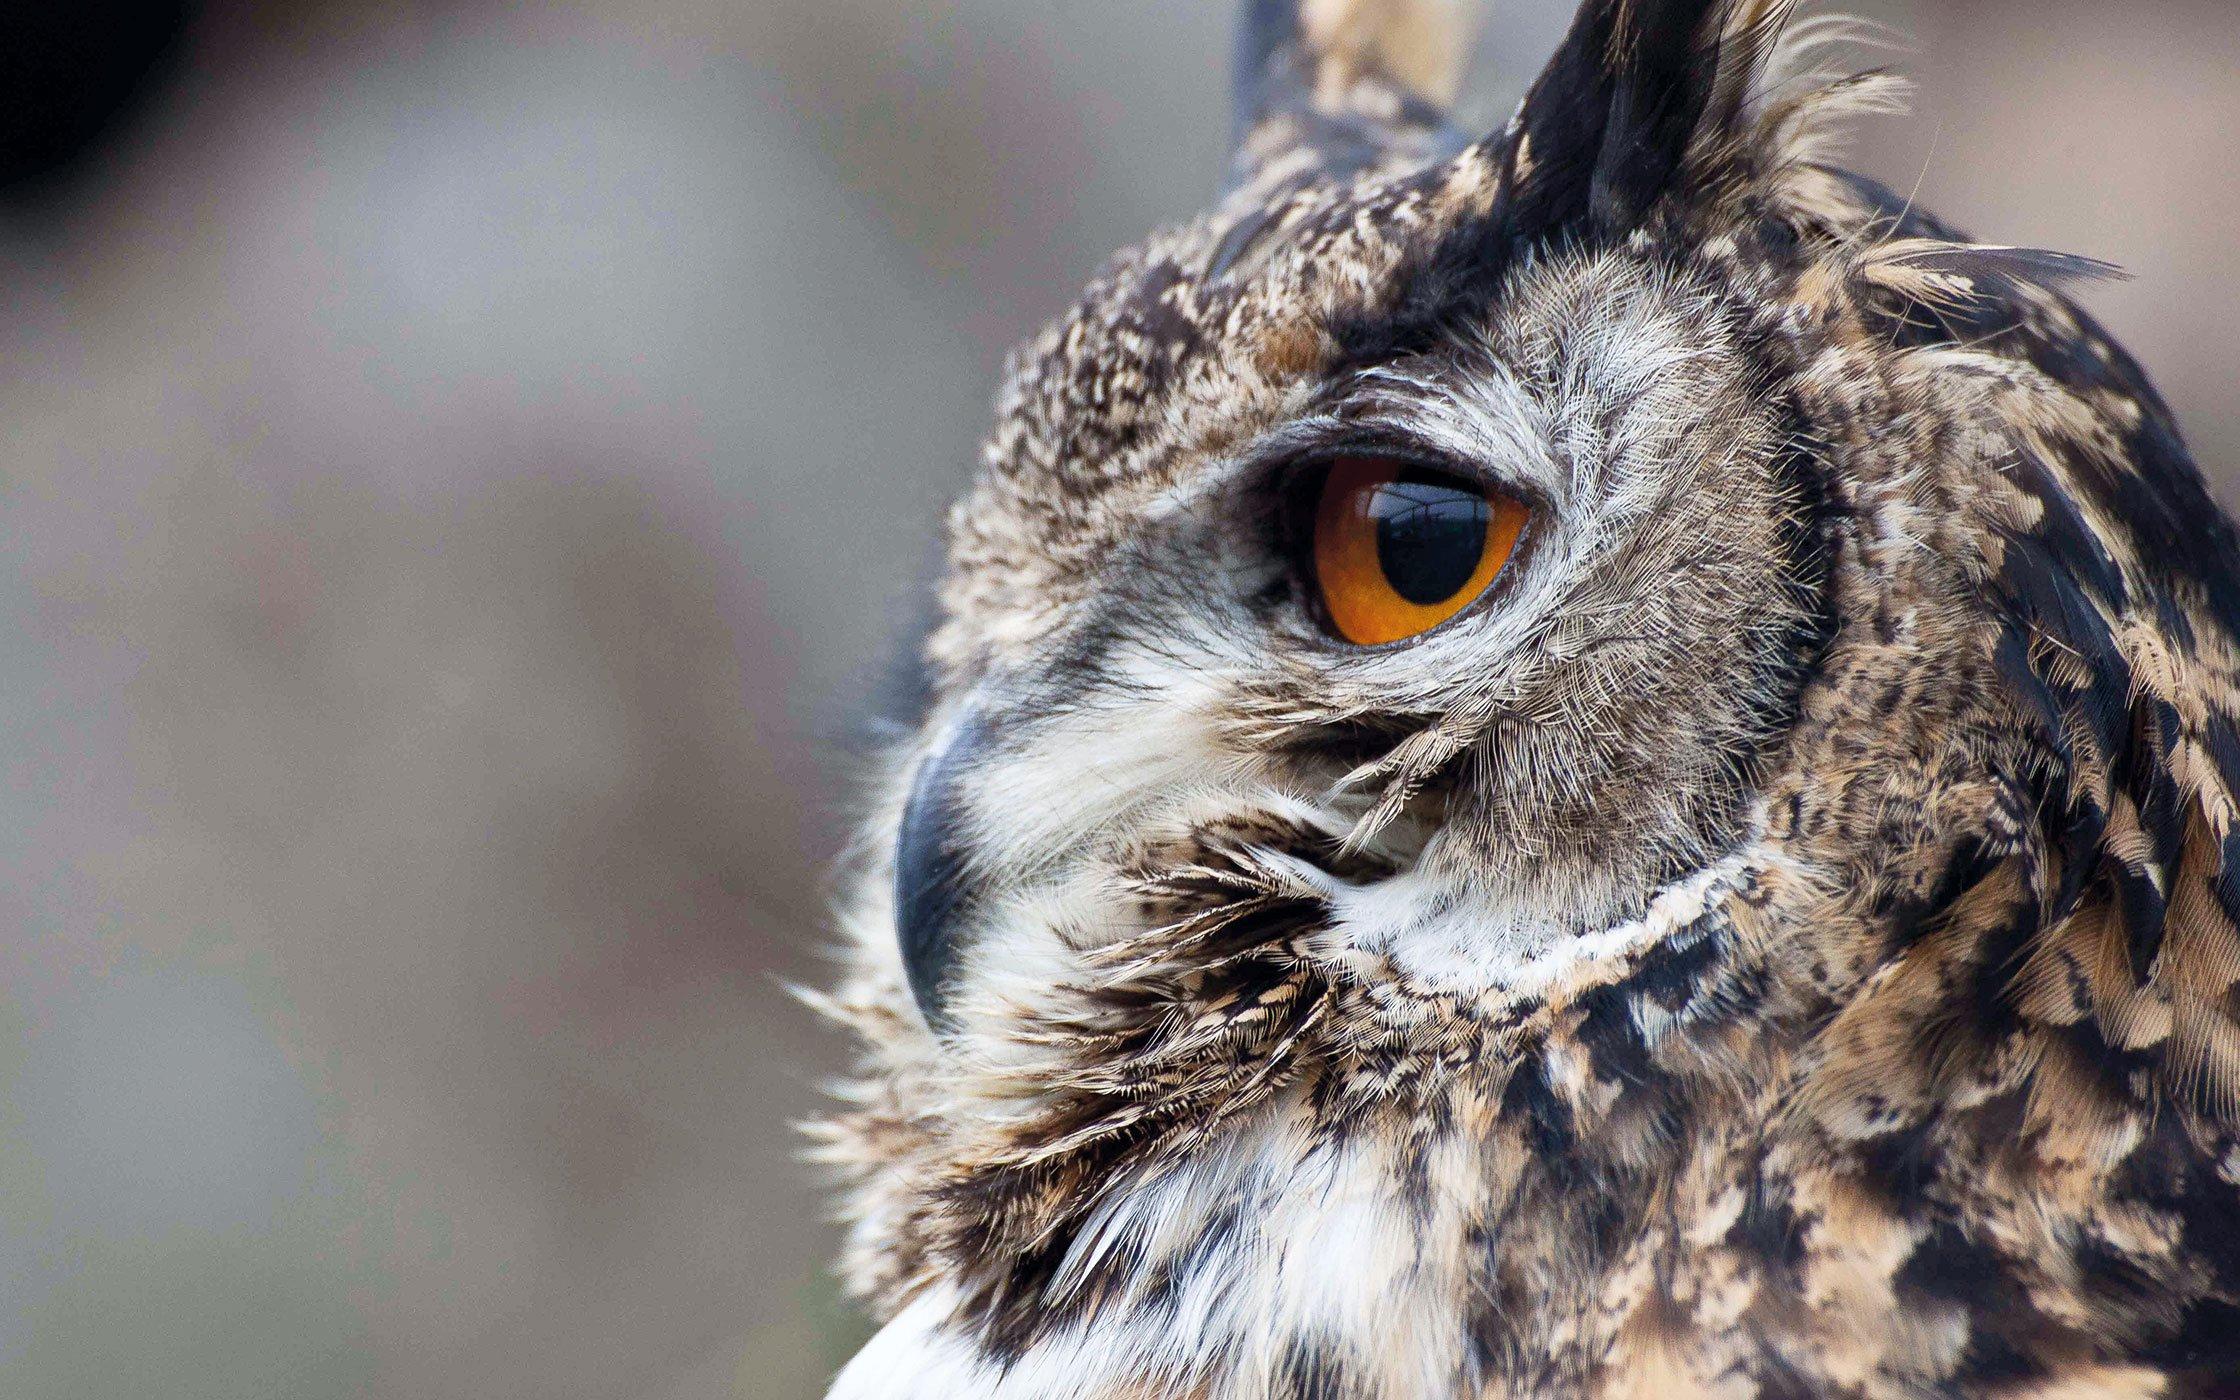 Owl - profile view